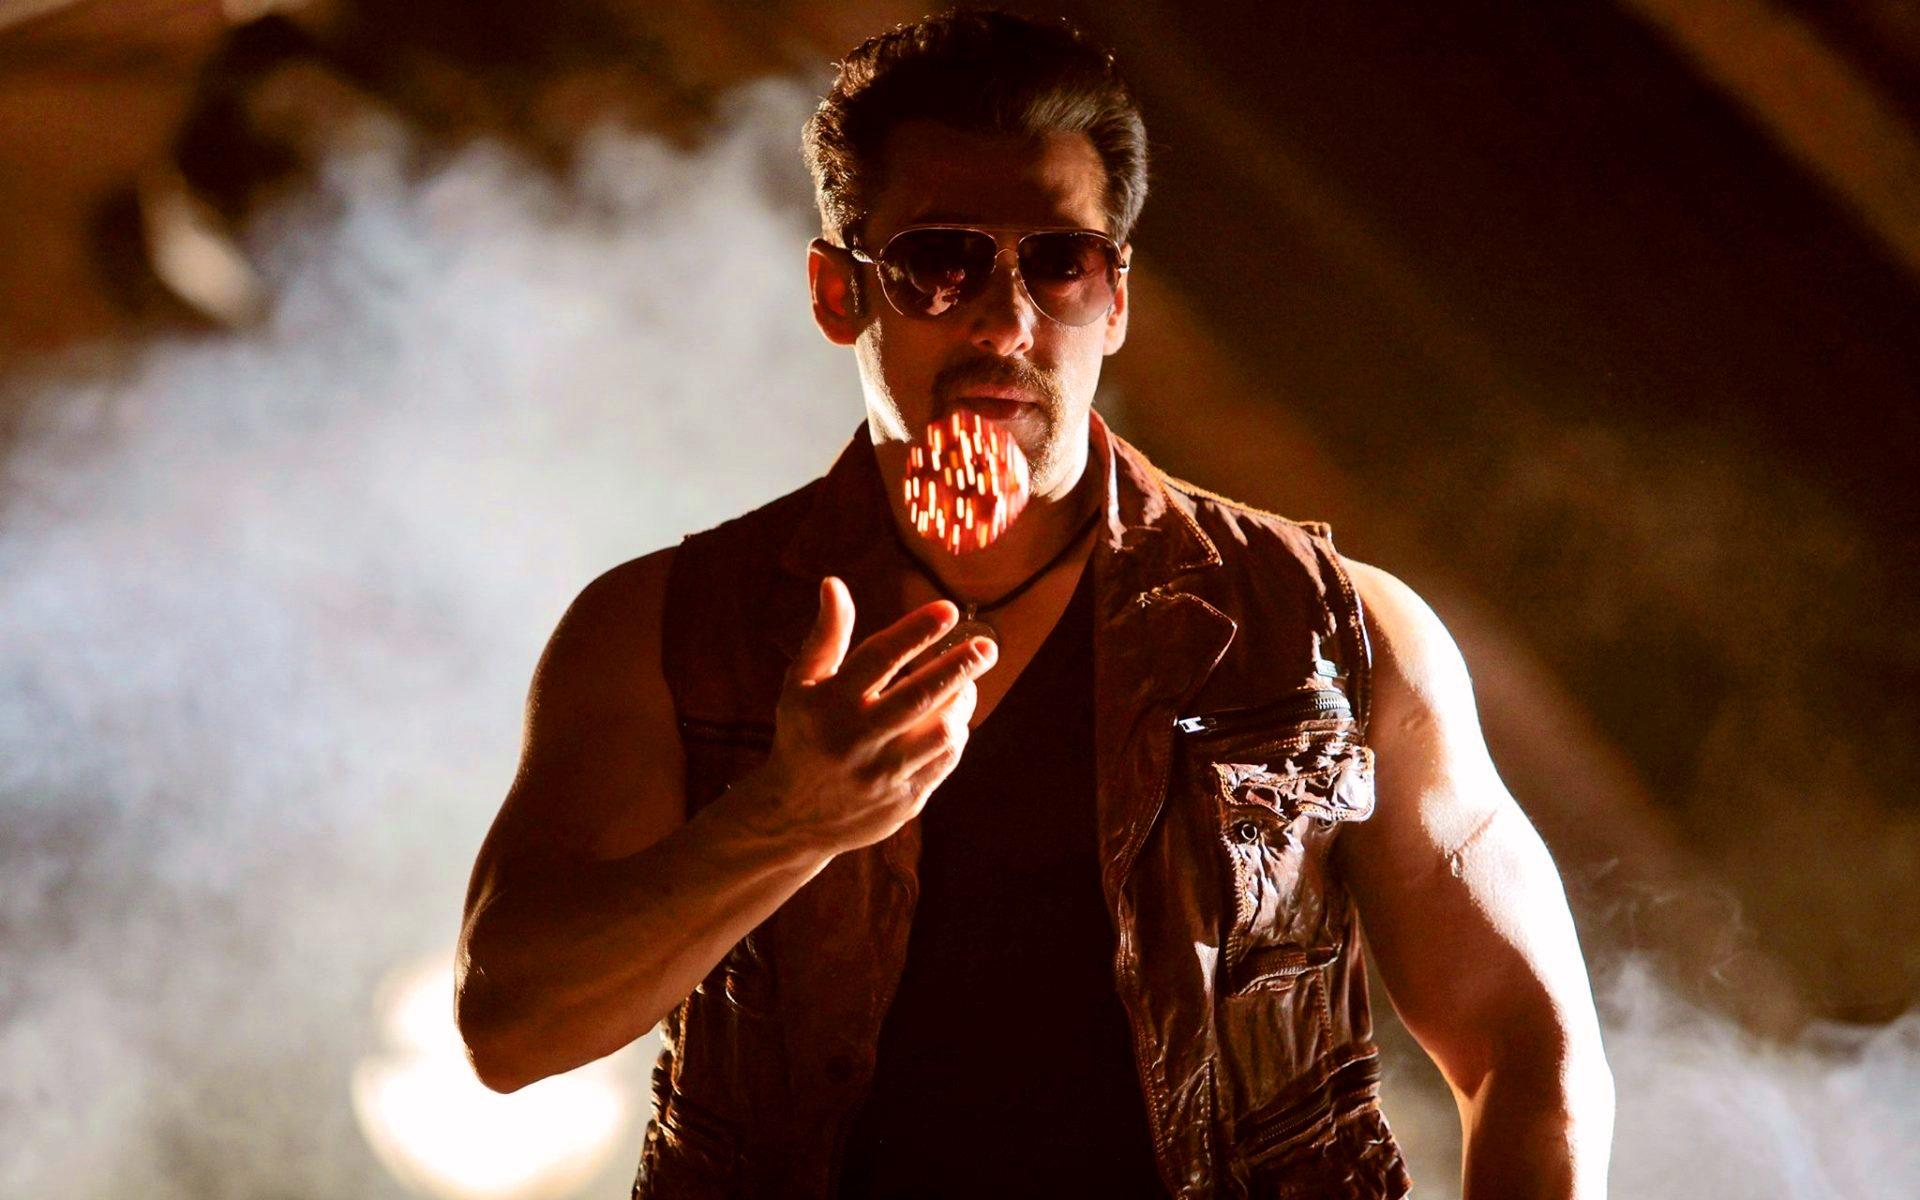 Salman Khan New Look At Kick Movie Wallpapers - 1920x1200 ...